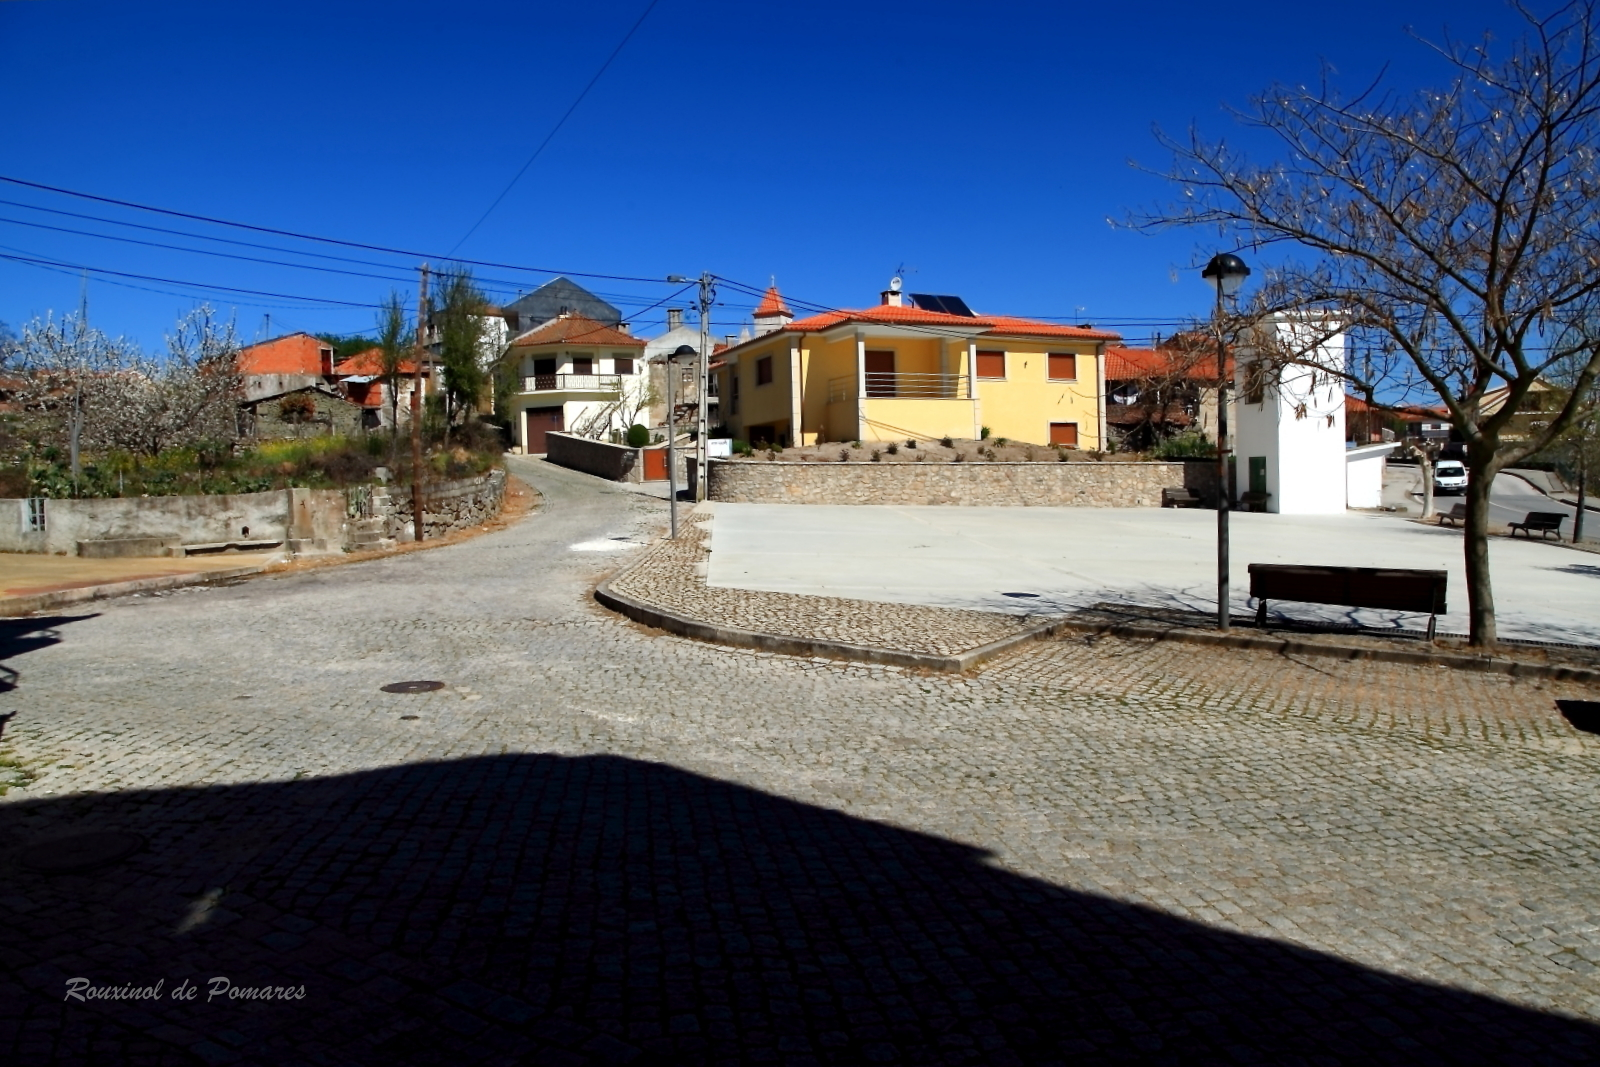 Fiolhoso post 2 (001)